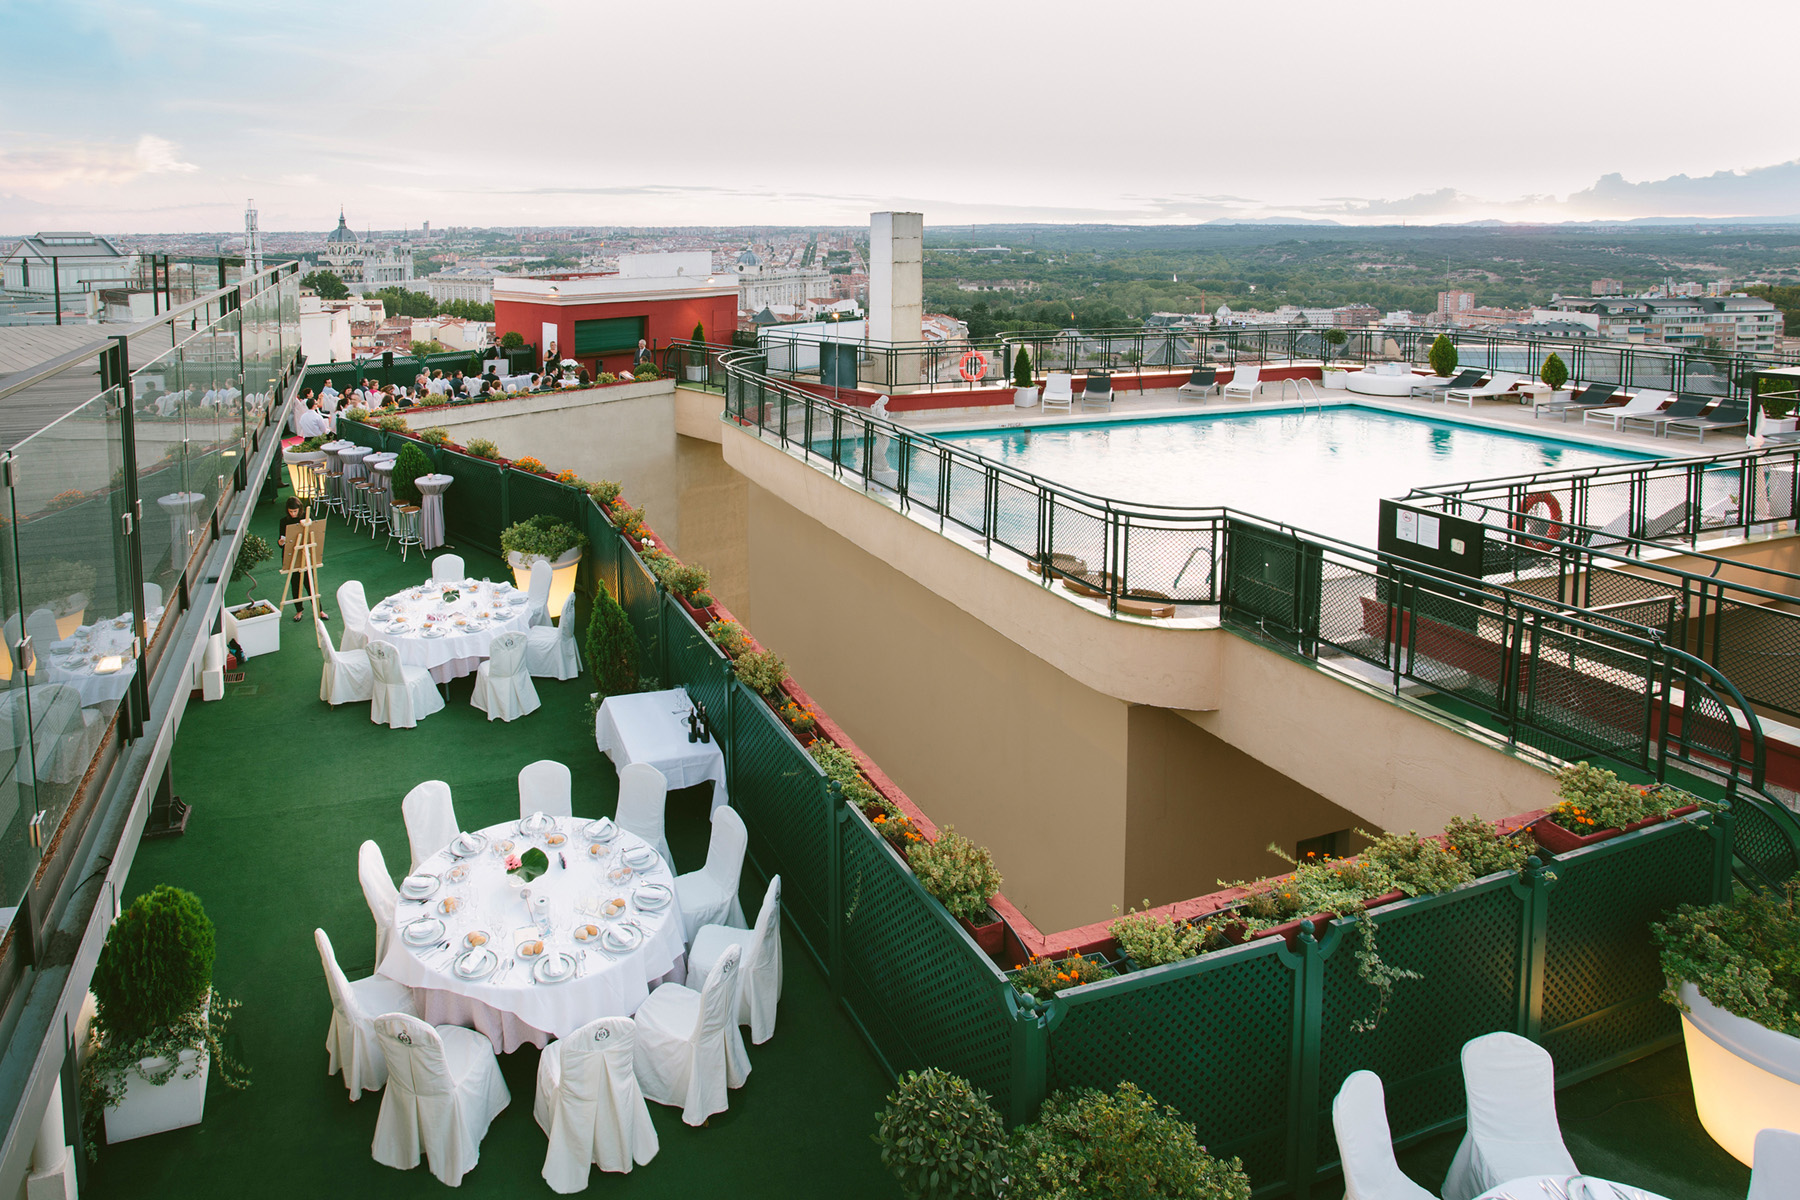 Hotel Emperador The Best Views Of Madrid Max Tourism